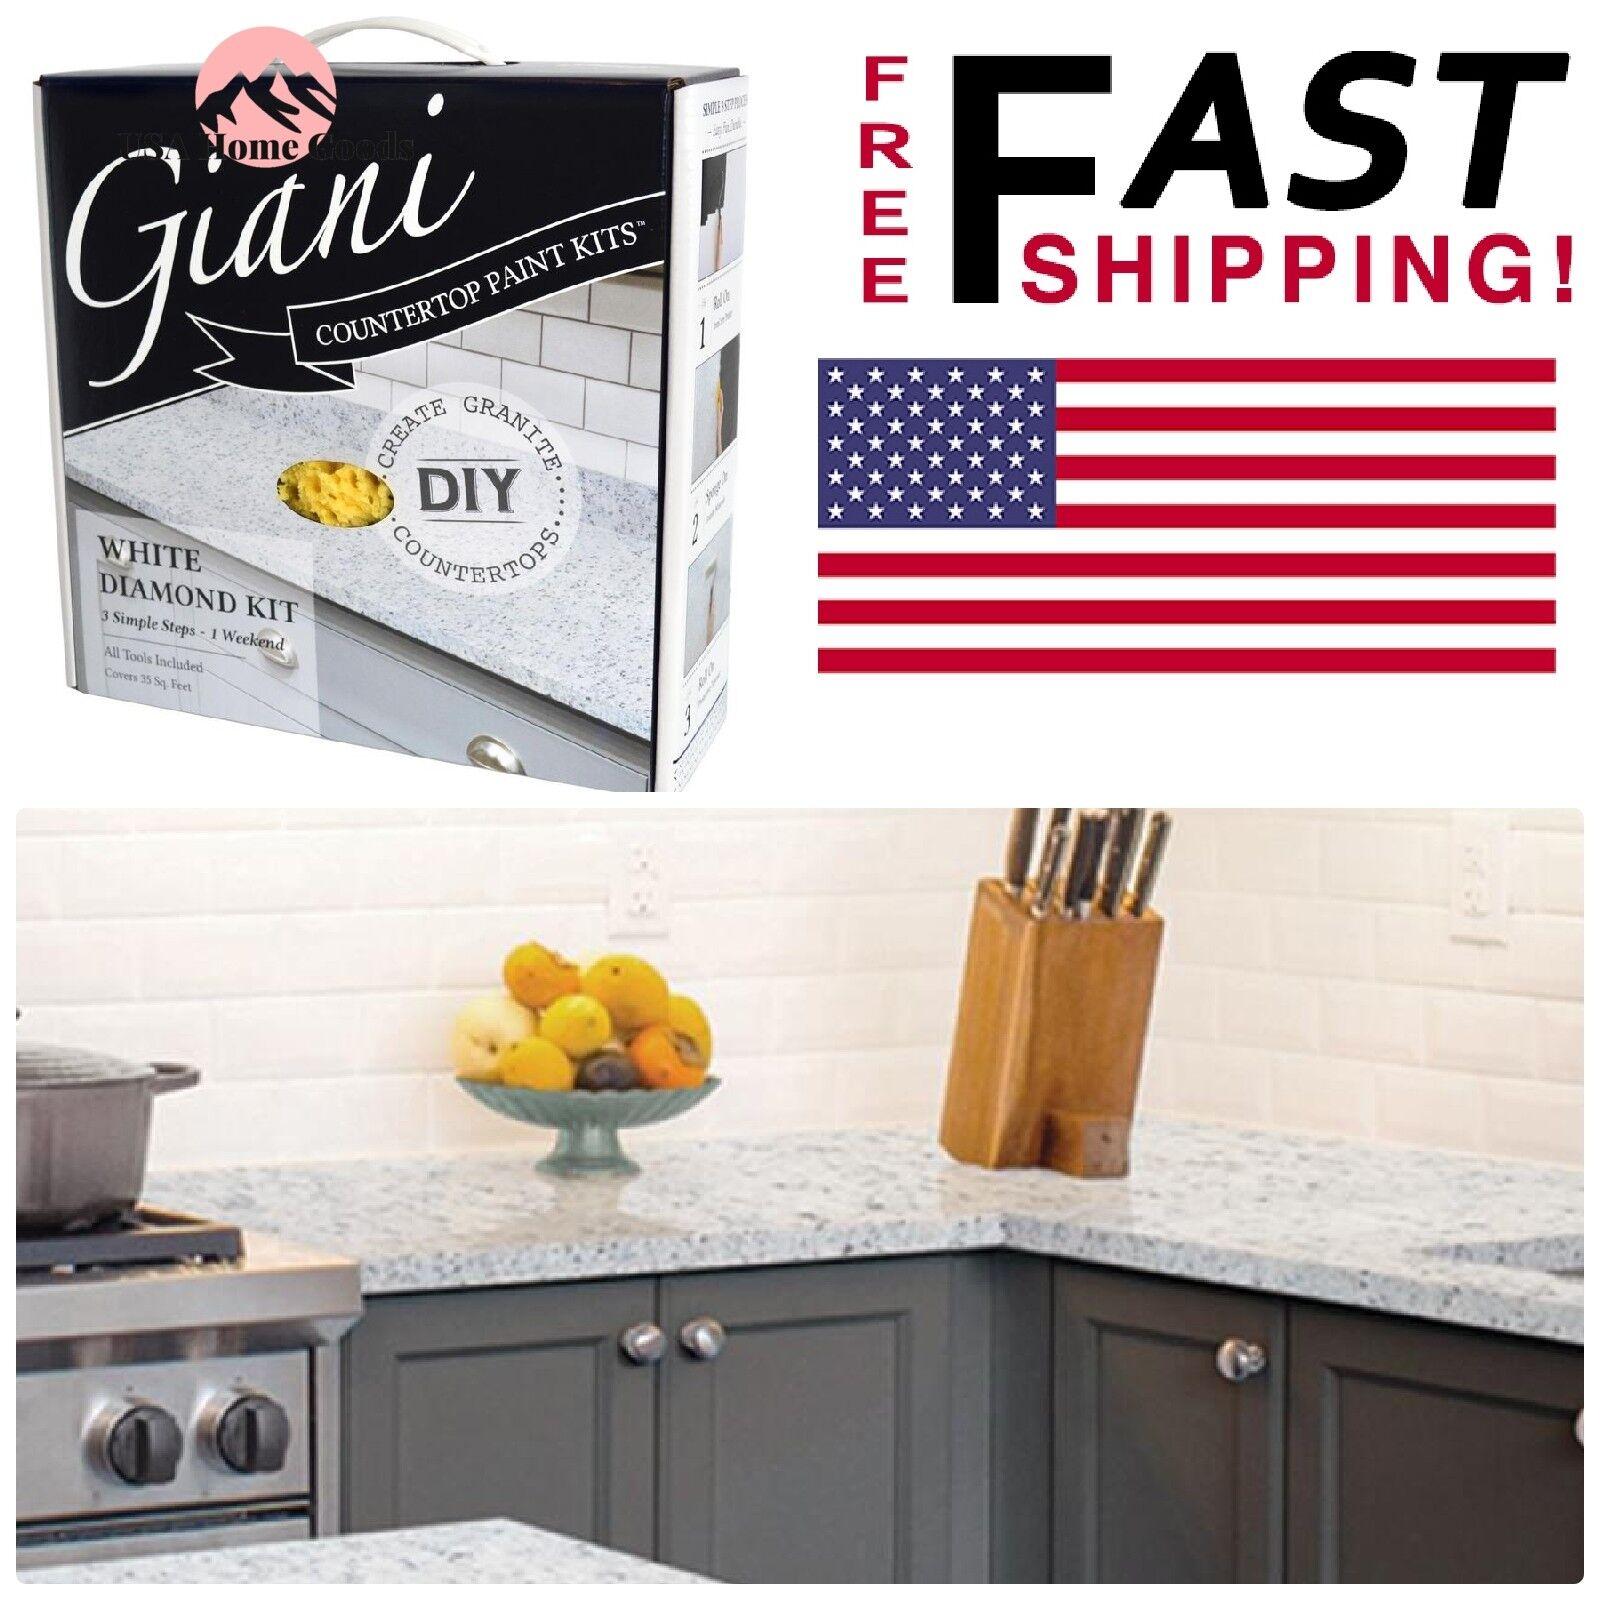 Giani Granite Countertop Paint Small Project Kit White Diamond Kitchen